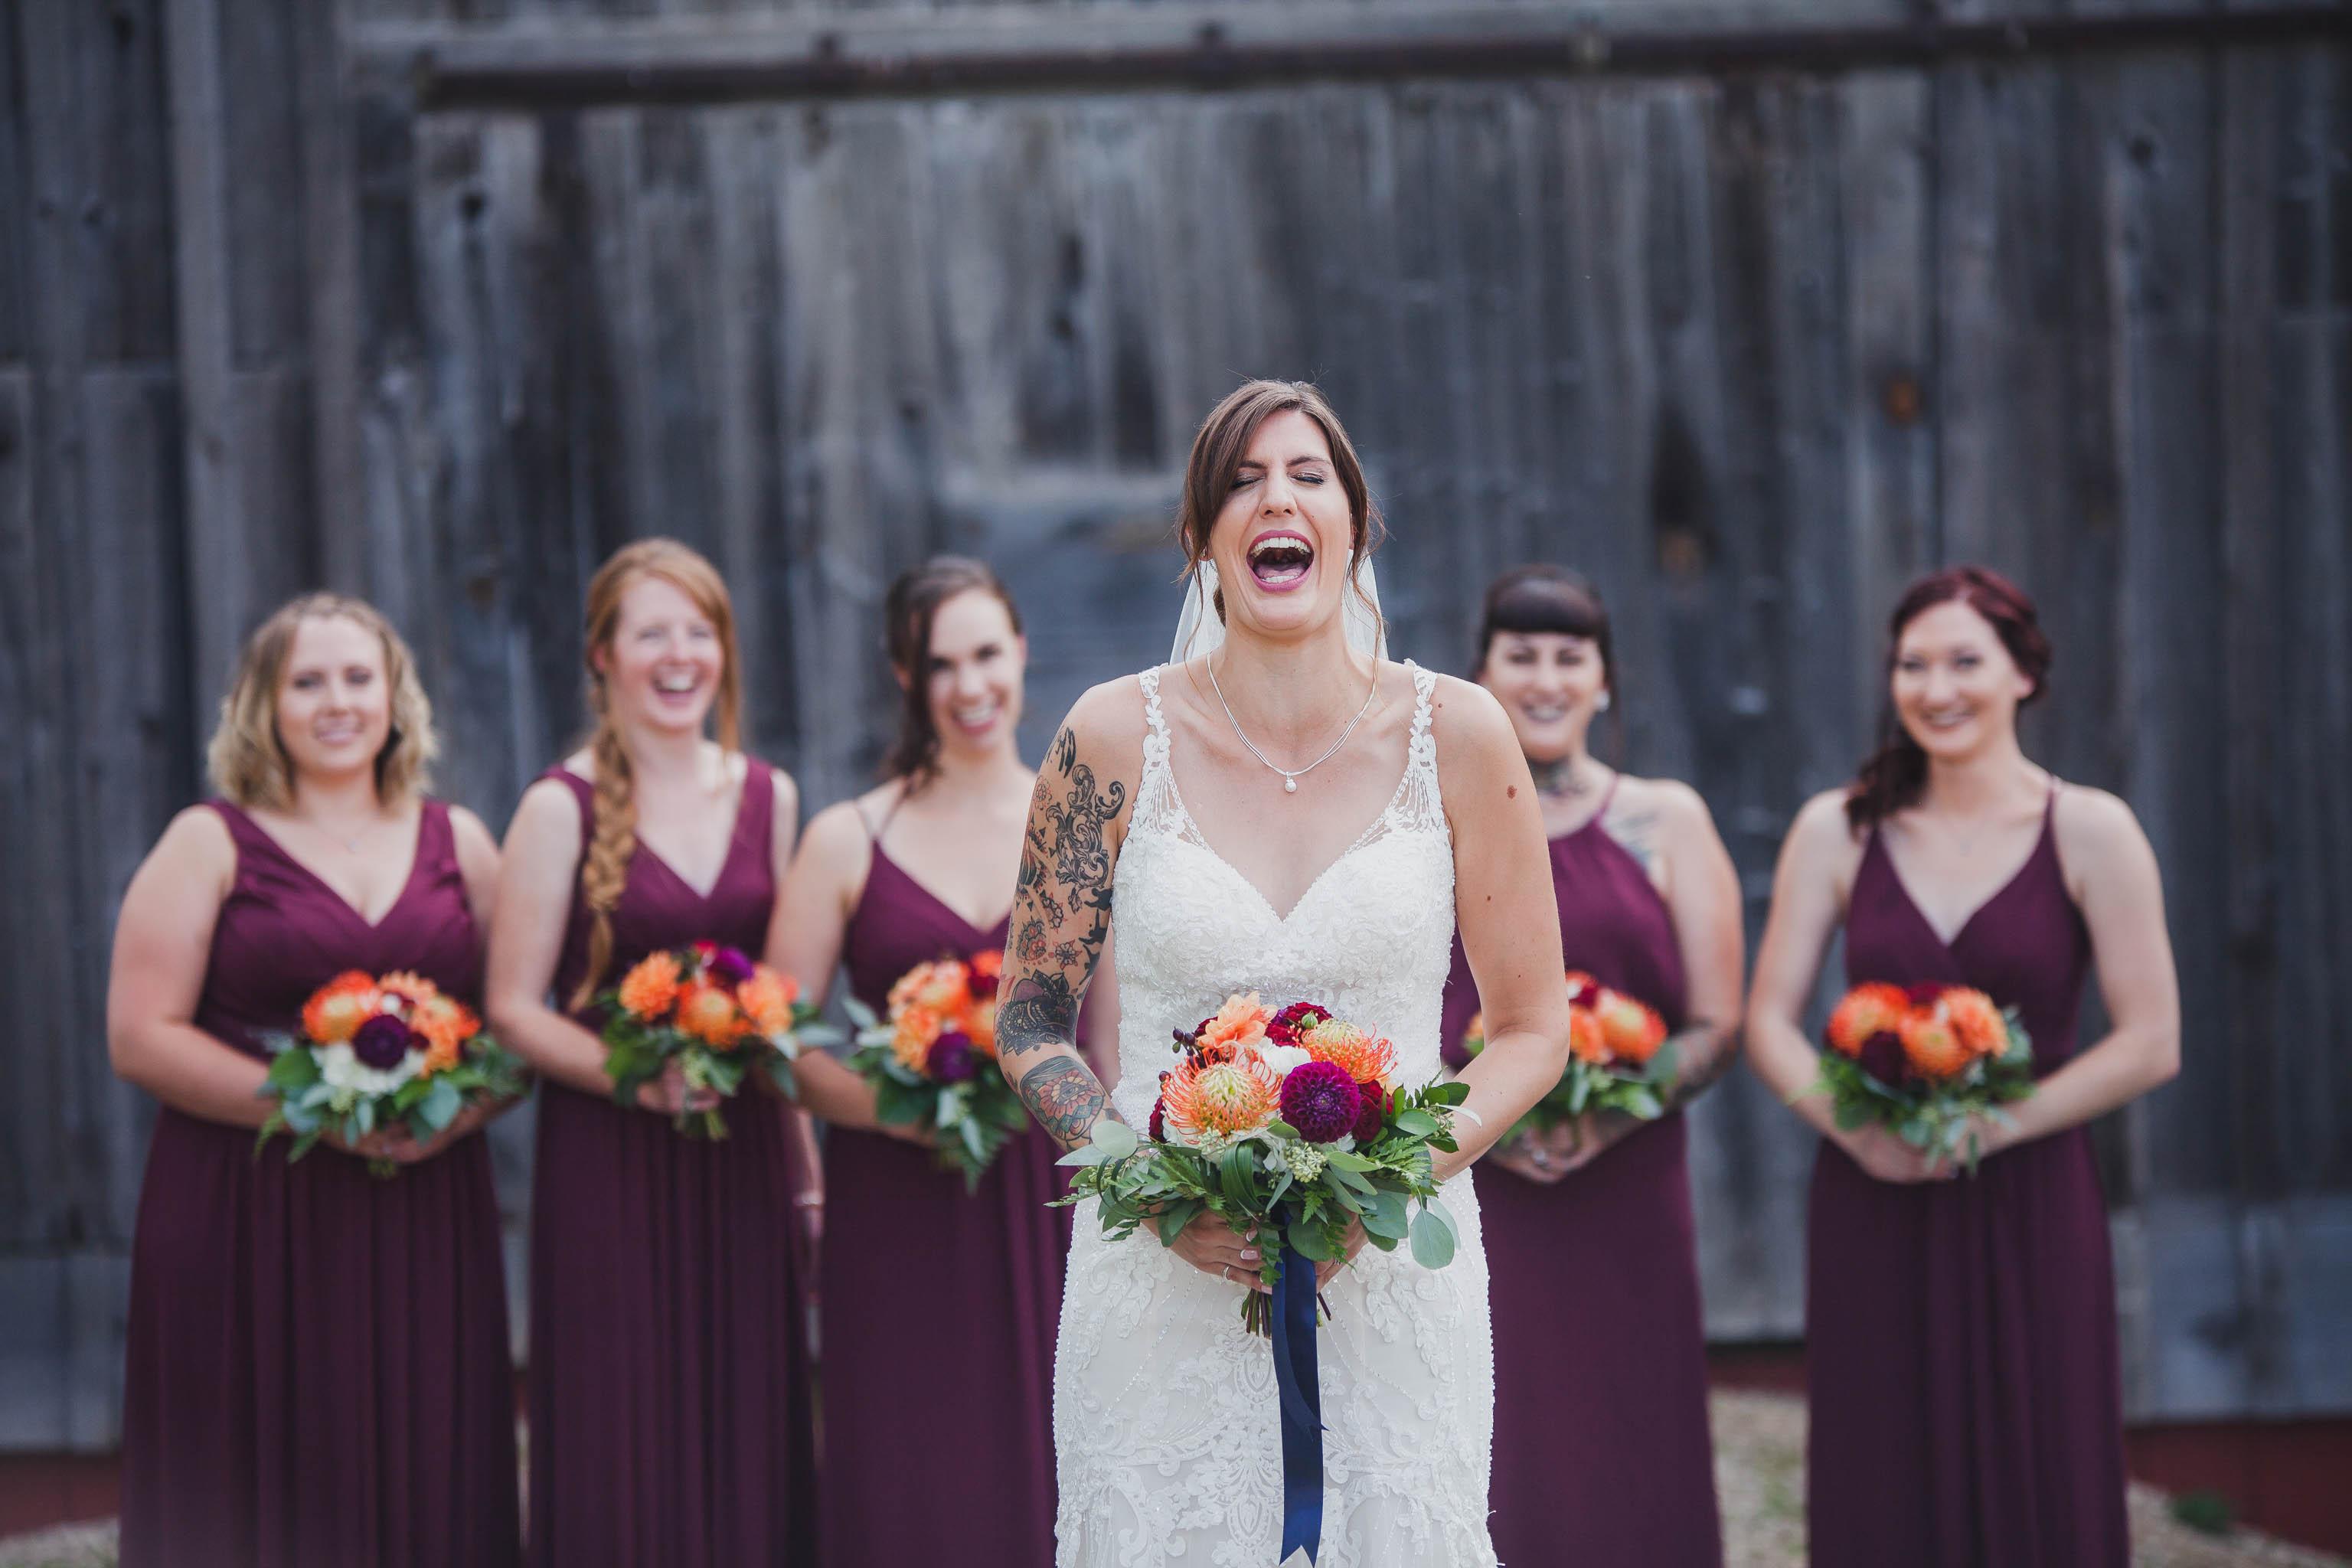 Owen Sound wedding photography